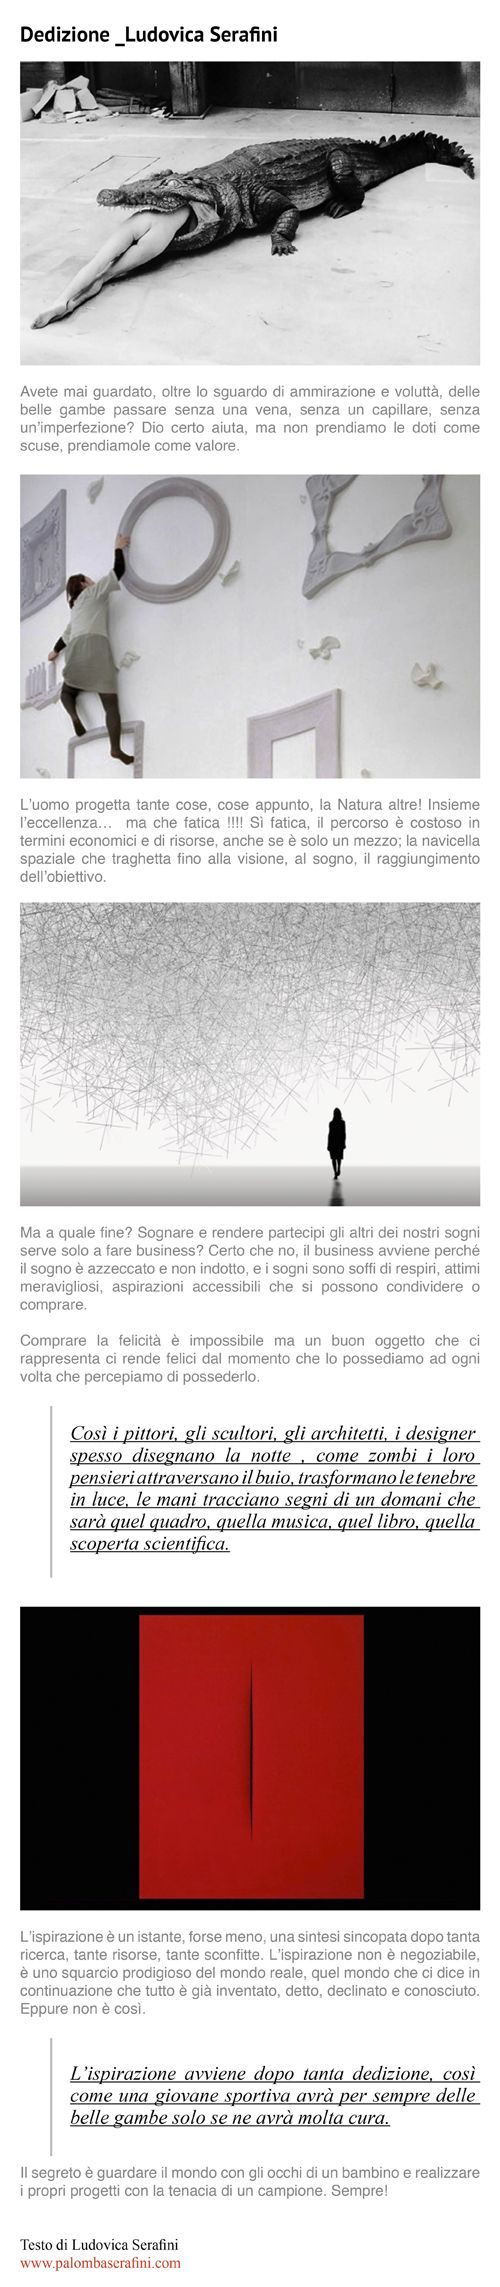 June 28th 2013   Ludovica Palomba #blog for @casatrend+   #design http://www.casatrendmag.it/1425/